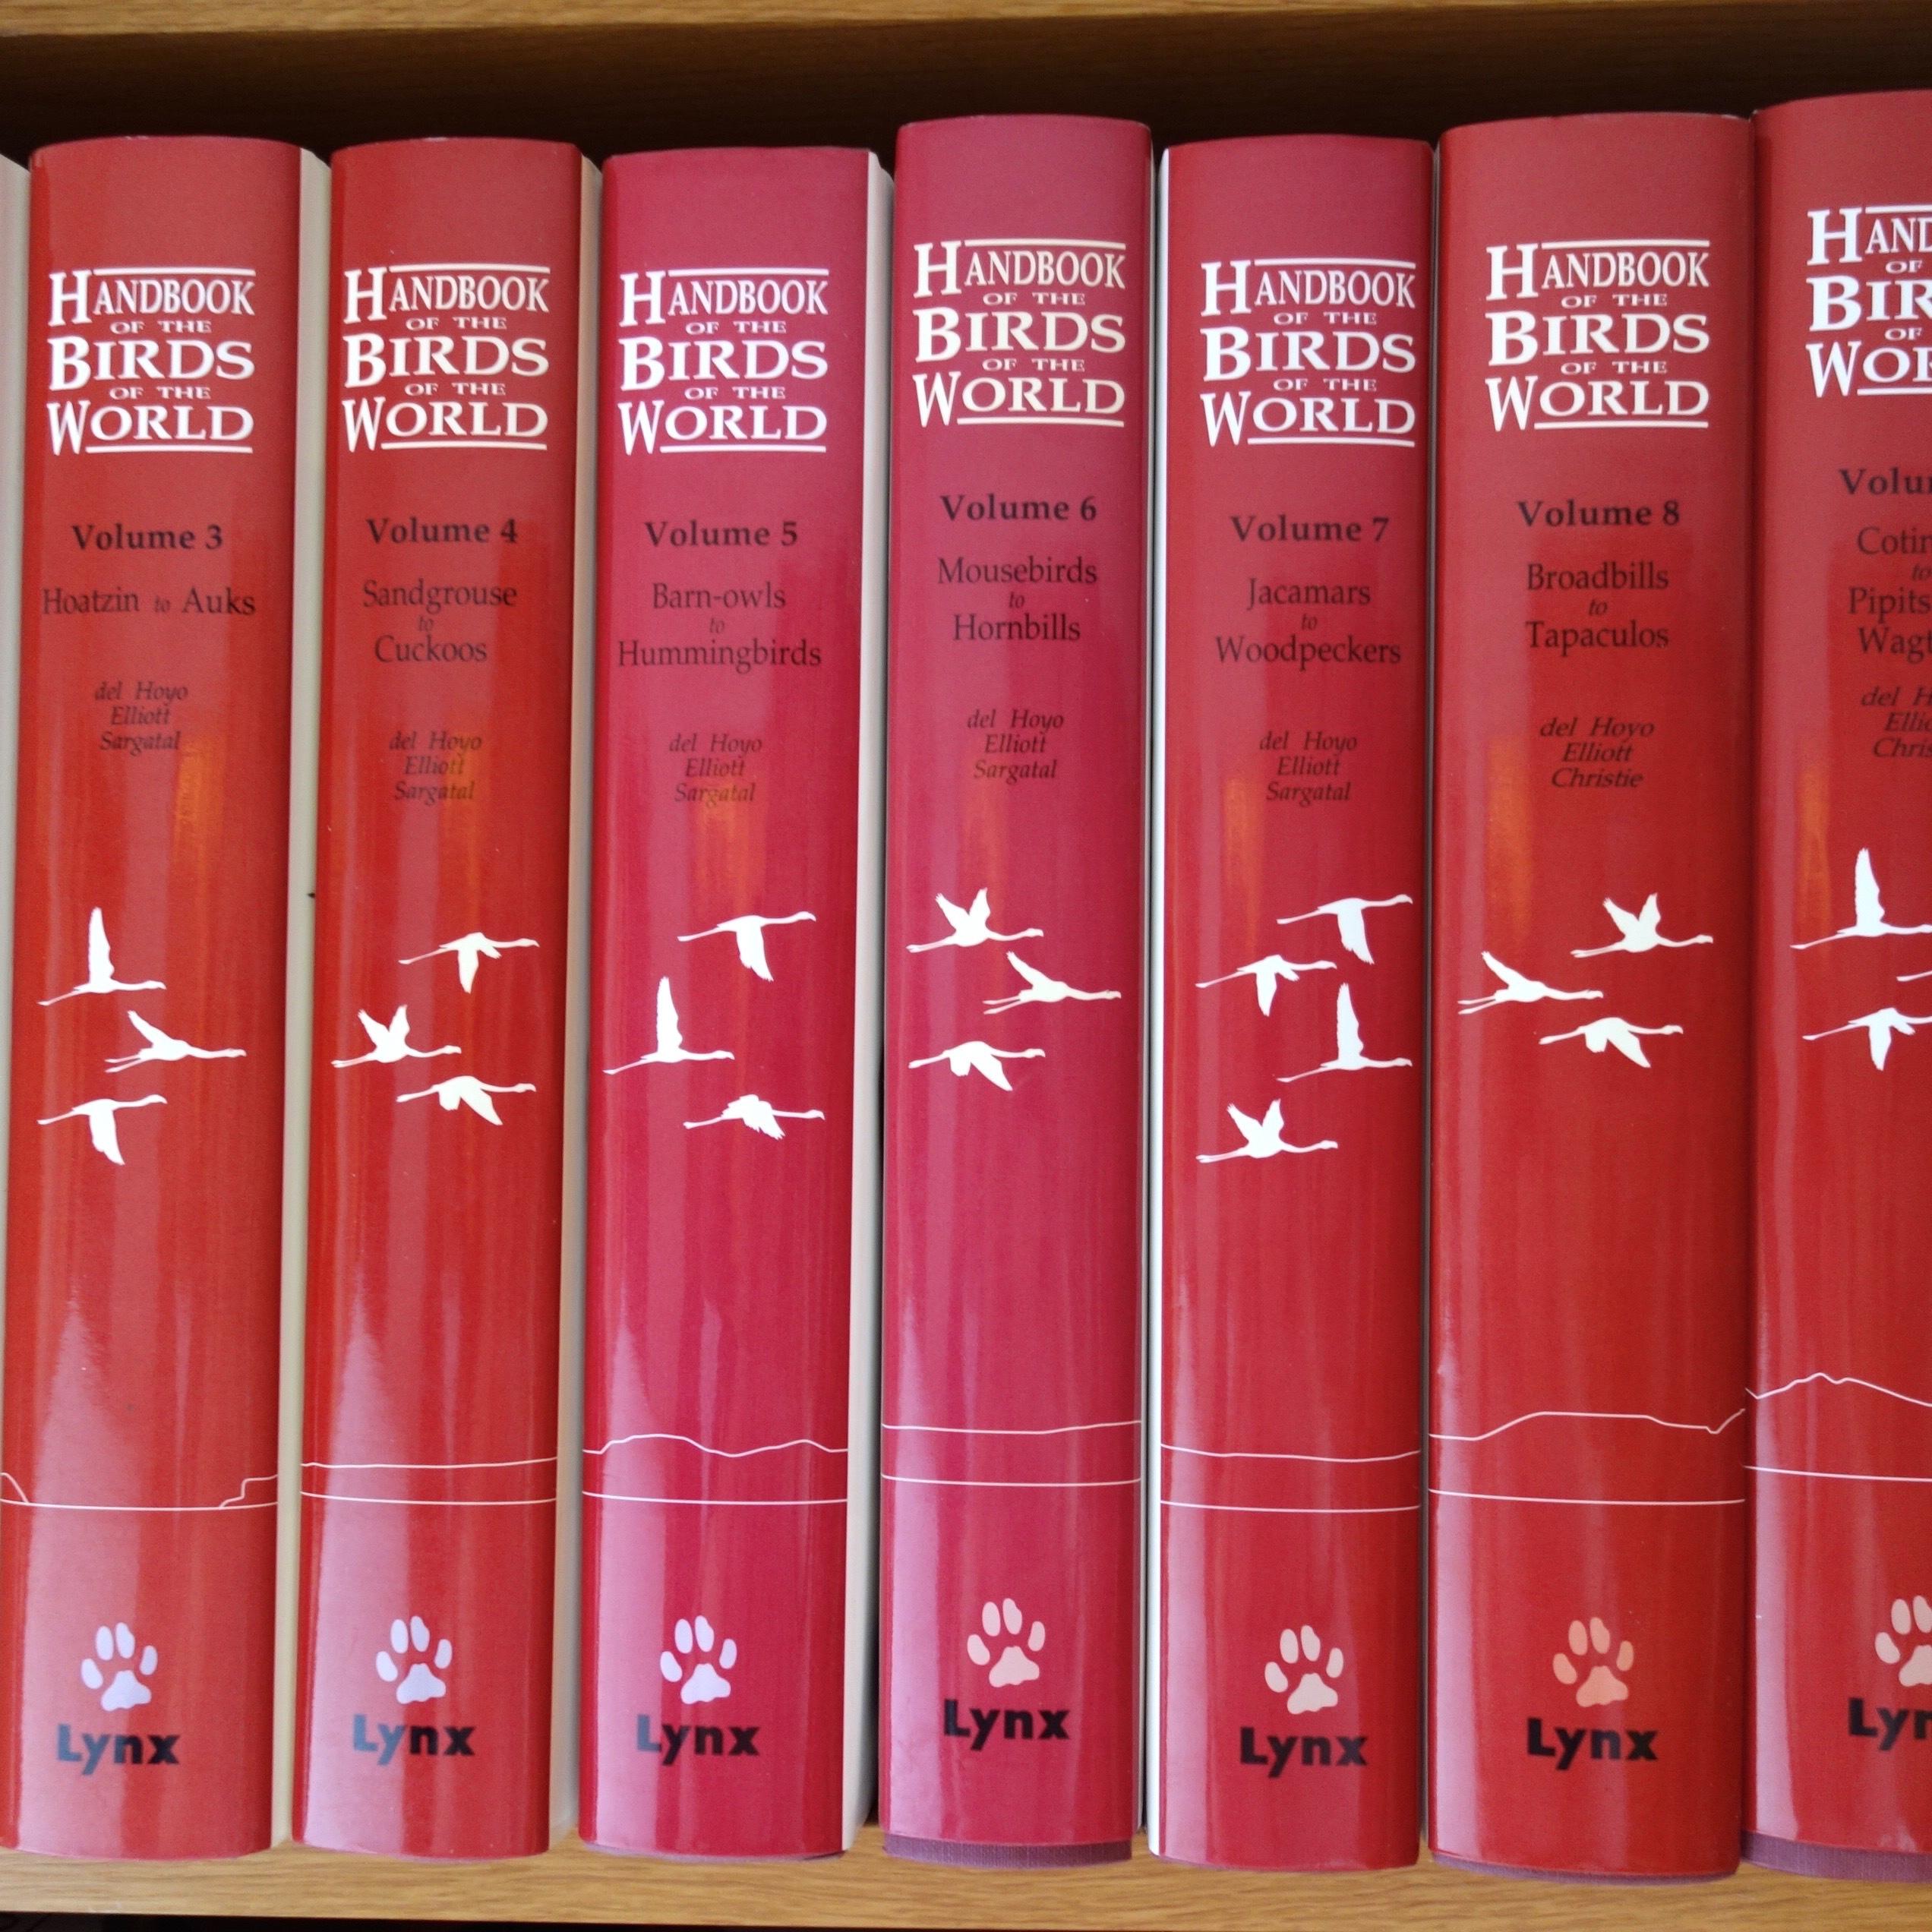 DEL HOYO A ELLIOTT SARGATEL AND D CHRISTIE Eds Books Maps Manuscripts